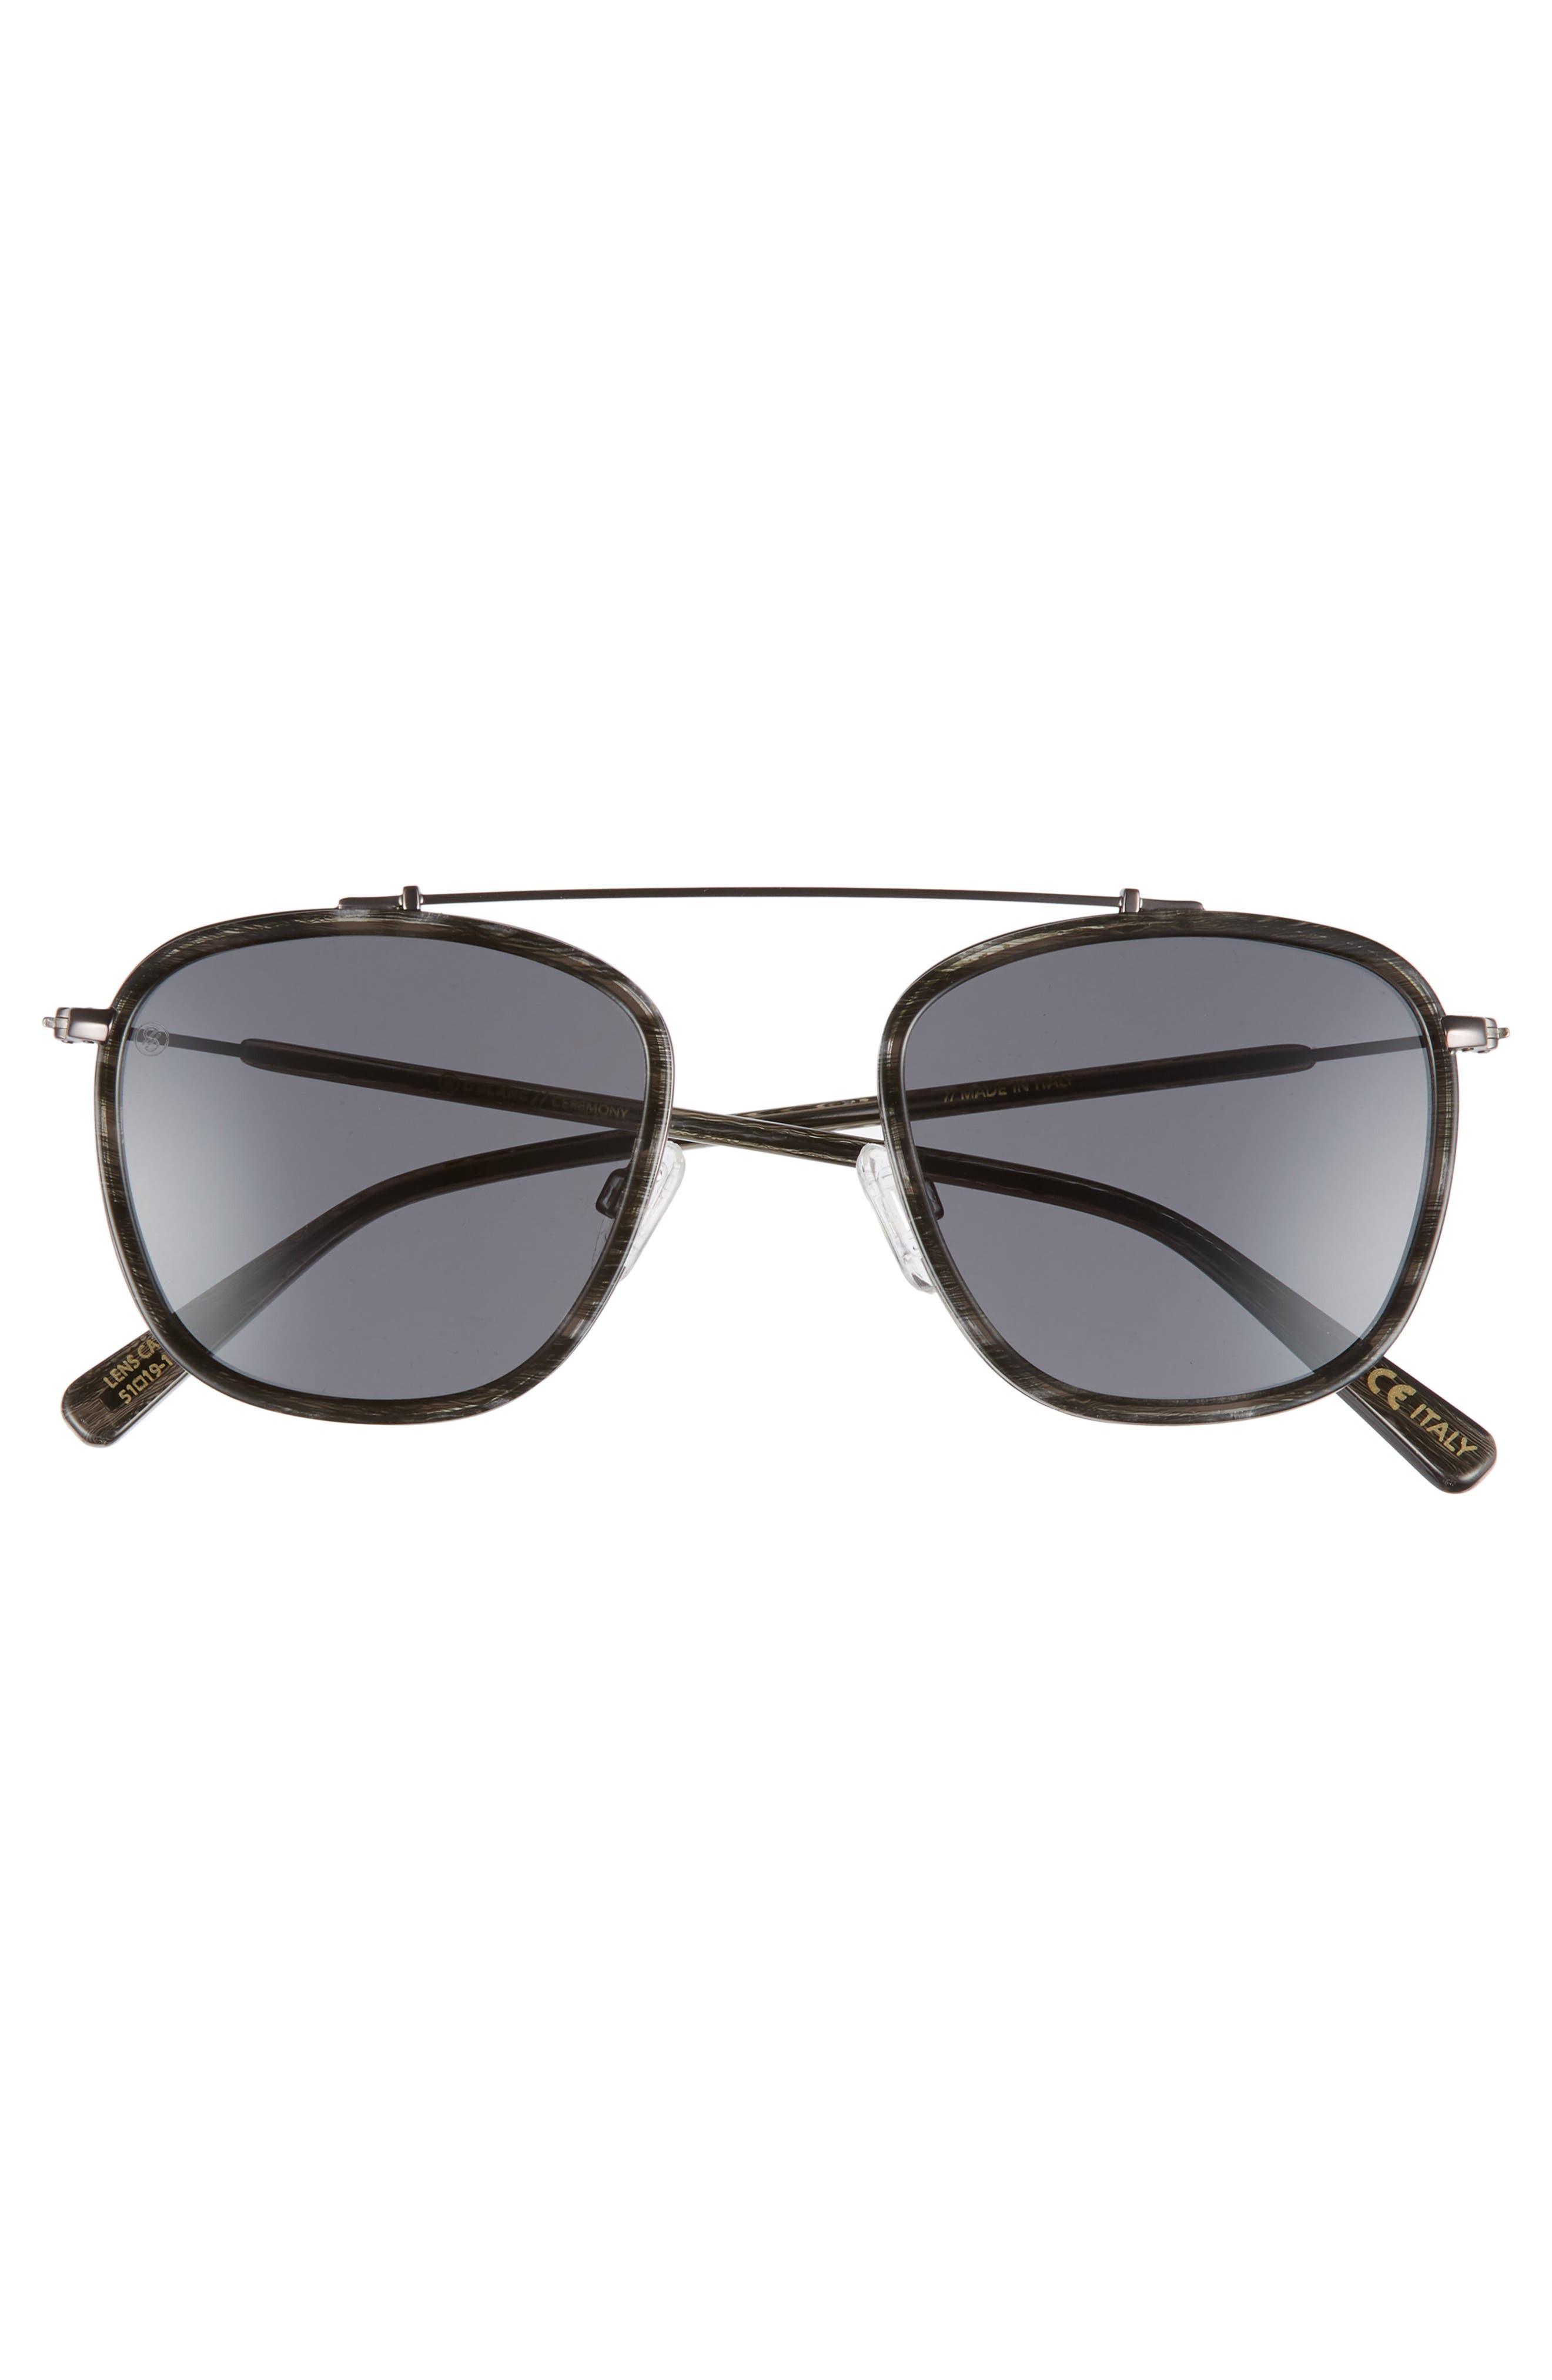 D'BLANC Ceremony 51mm Square Sunglasses,                             Alternate thumbnail 3, color,                             Charcoal Etch/ Grey